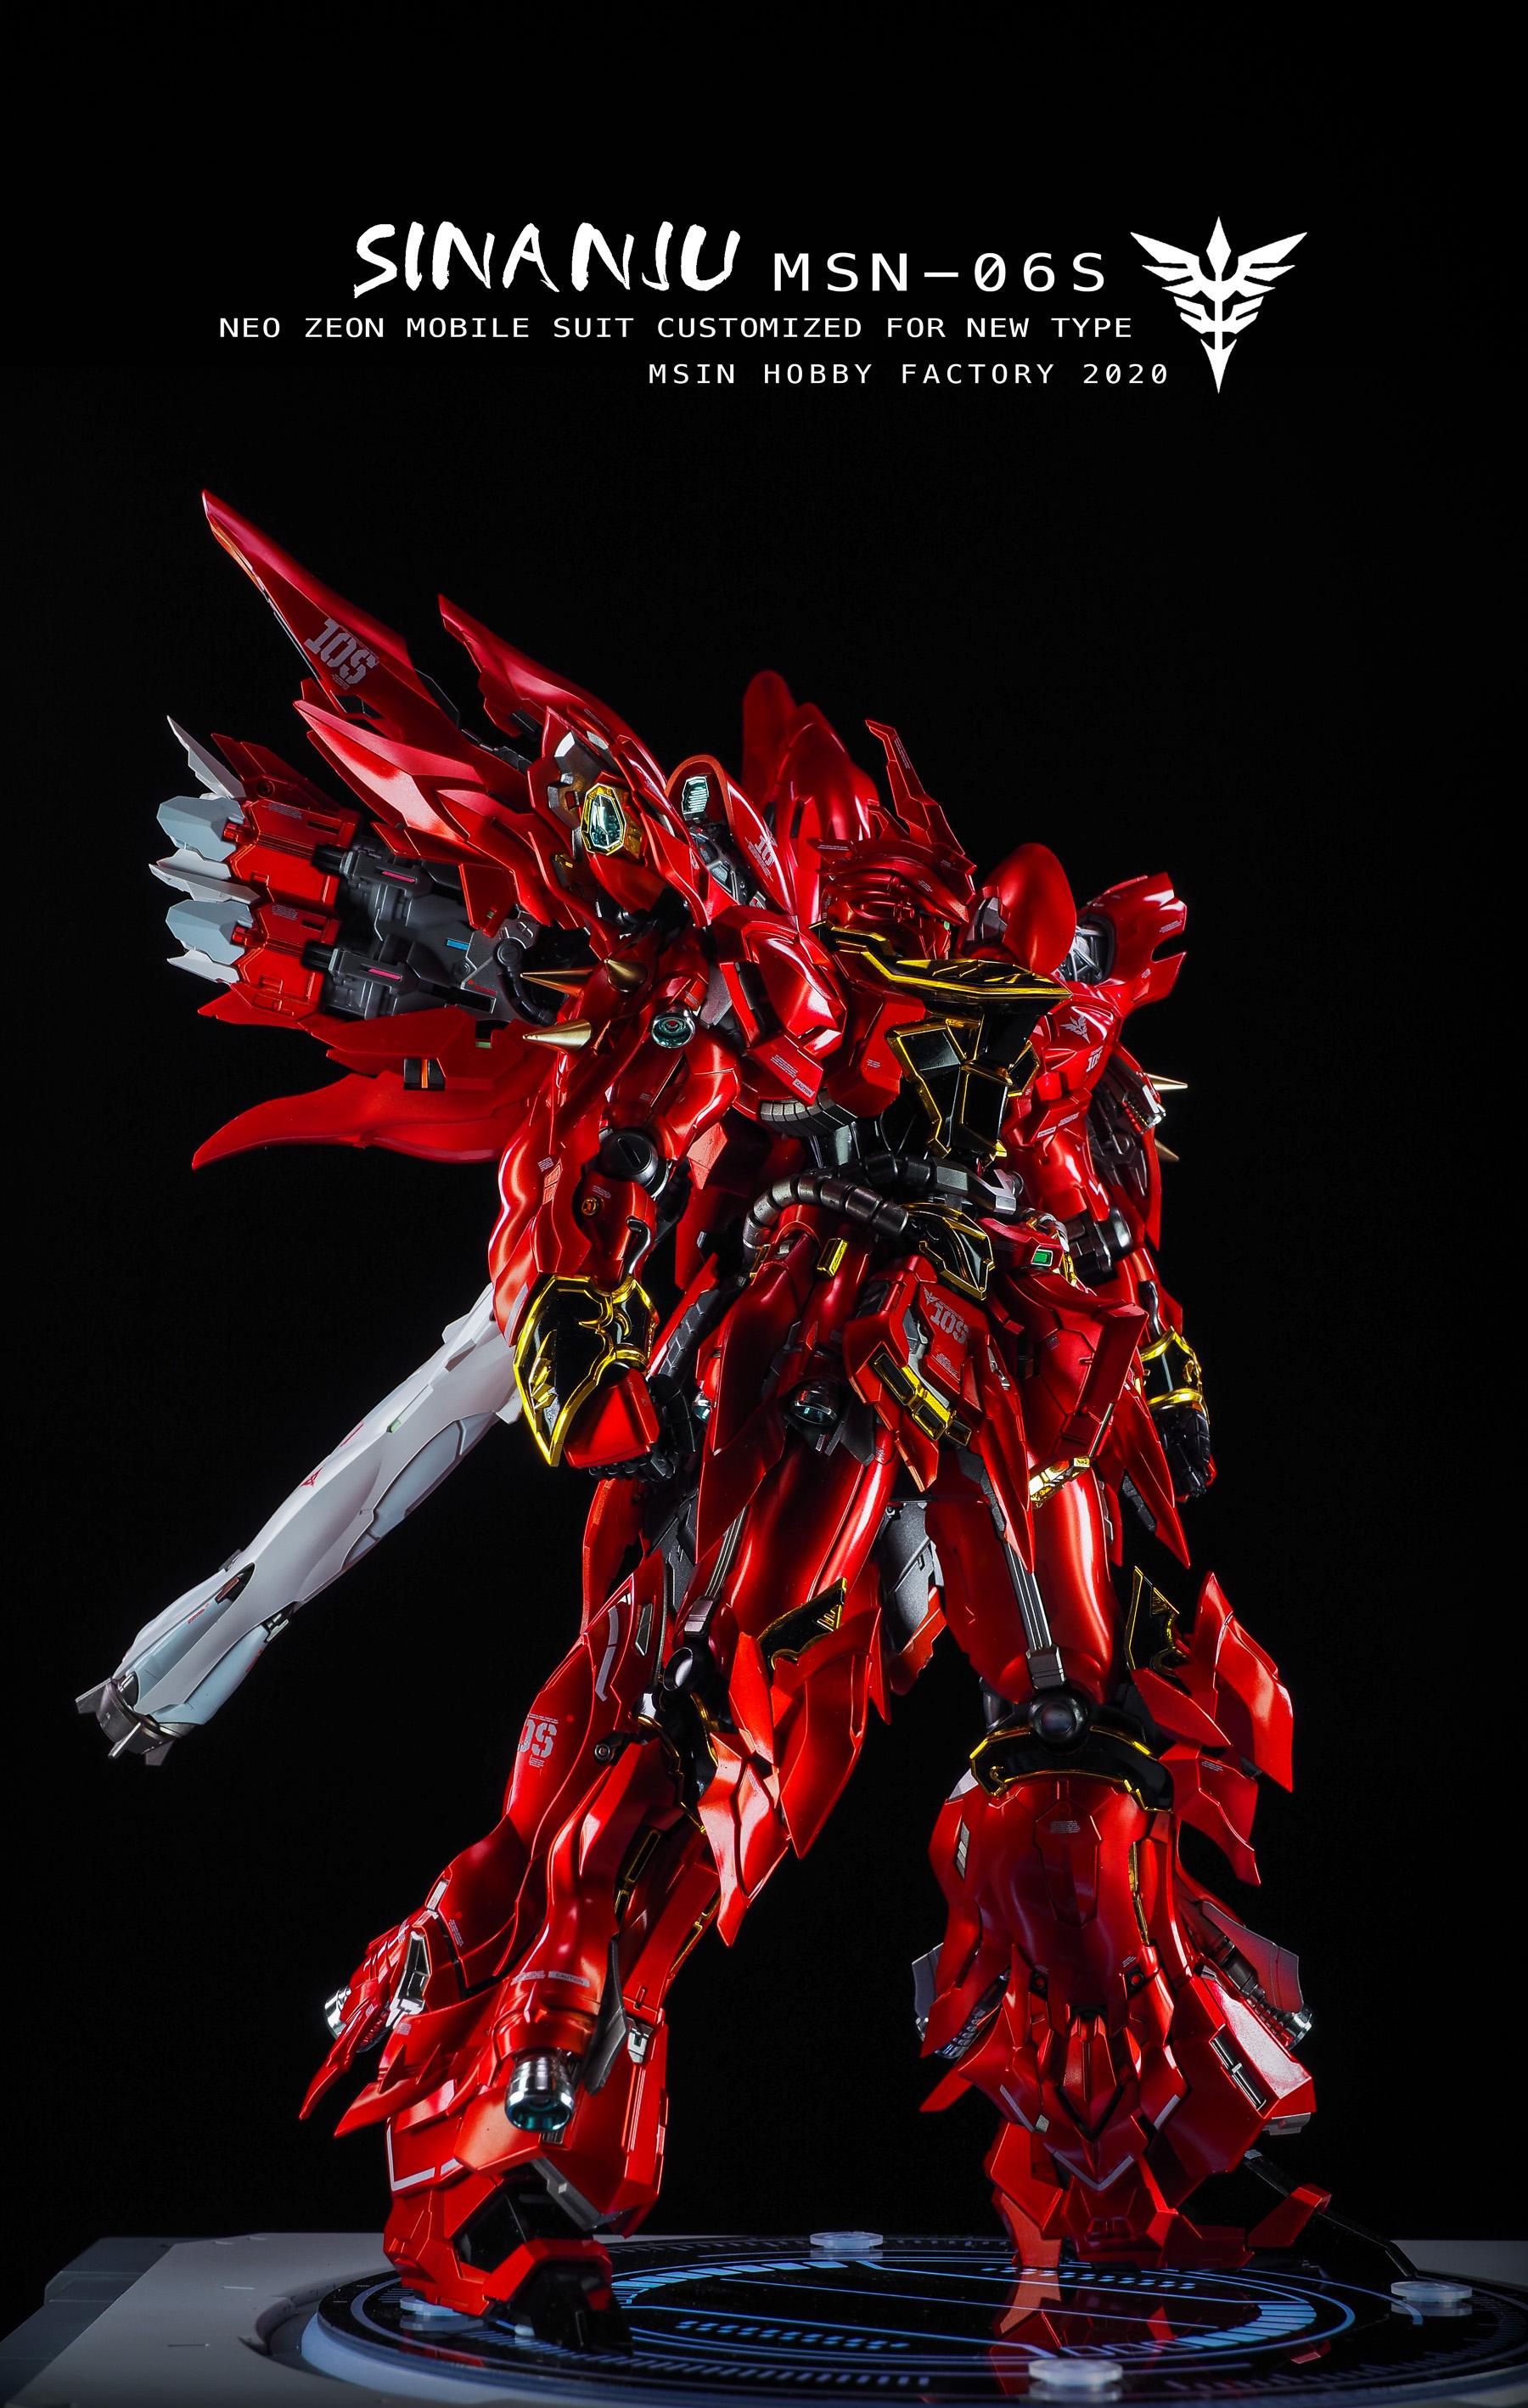 S437_6_takumi_sinanju_red_001.jpg